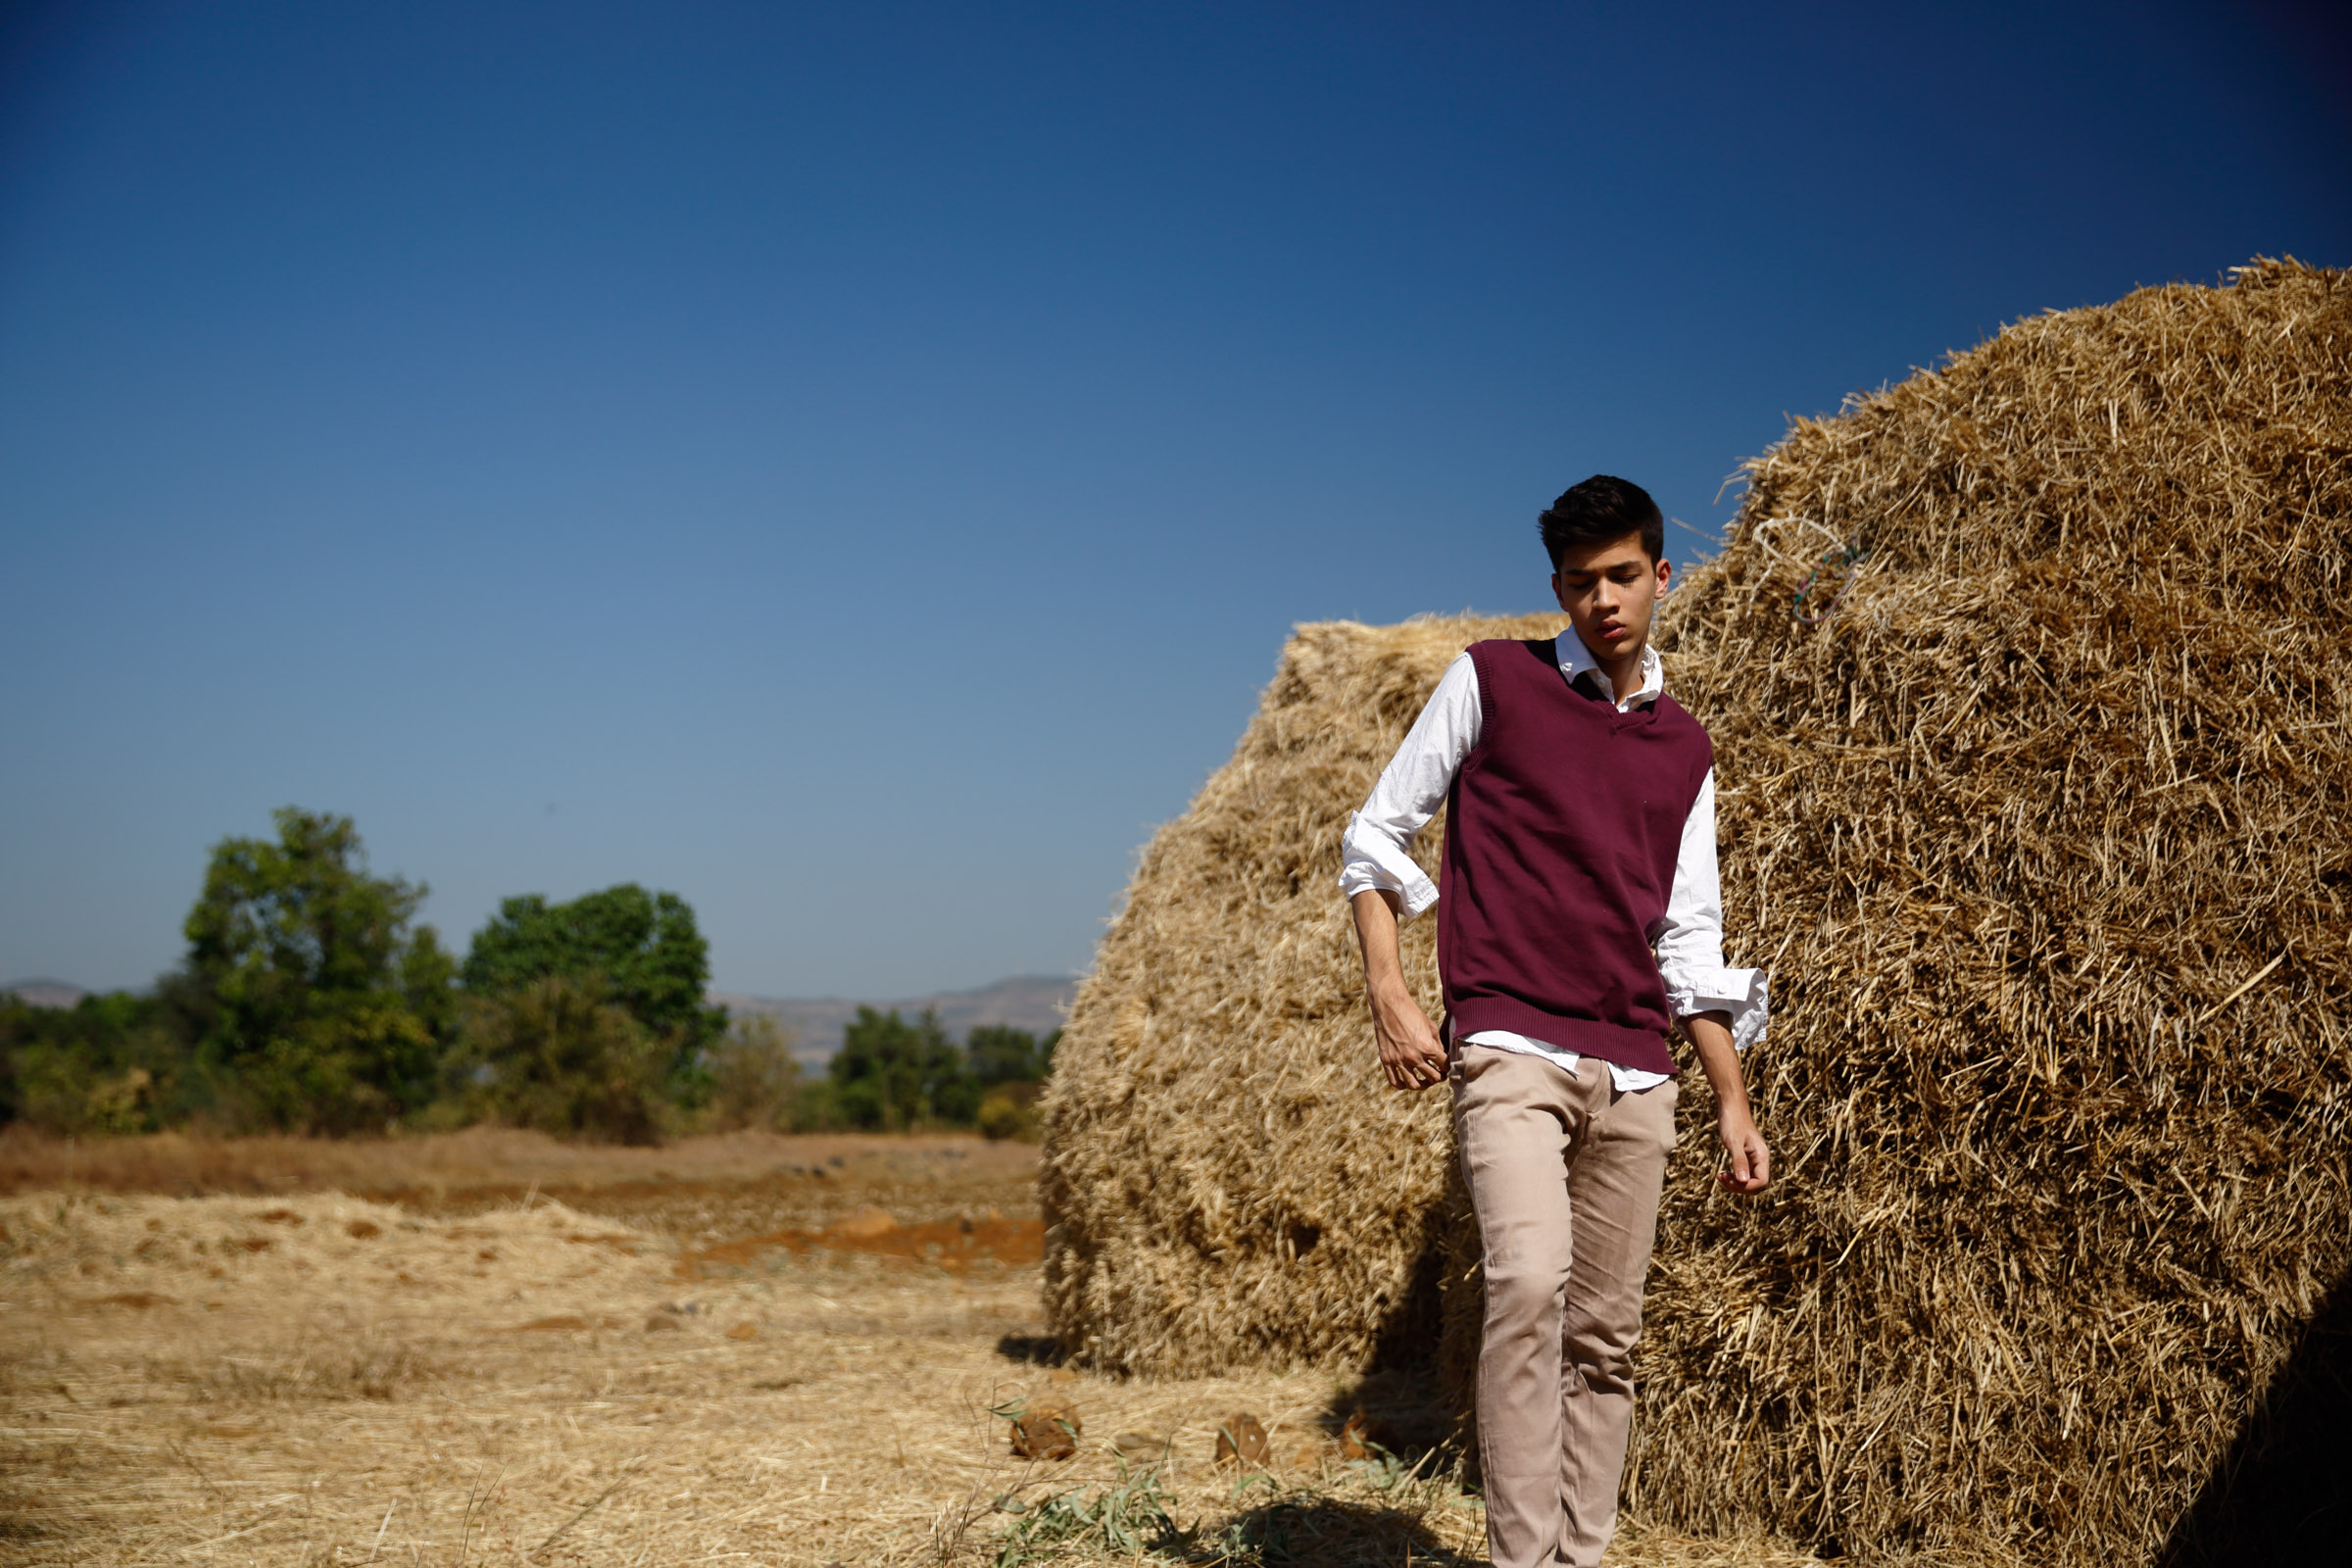 Kriator-Photographer-Country Roads_10.jpg